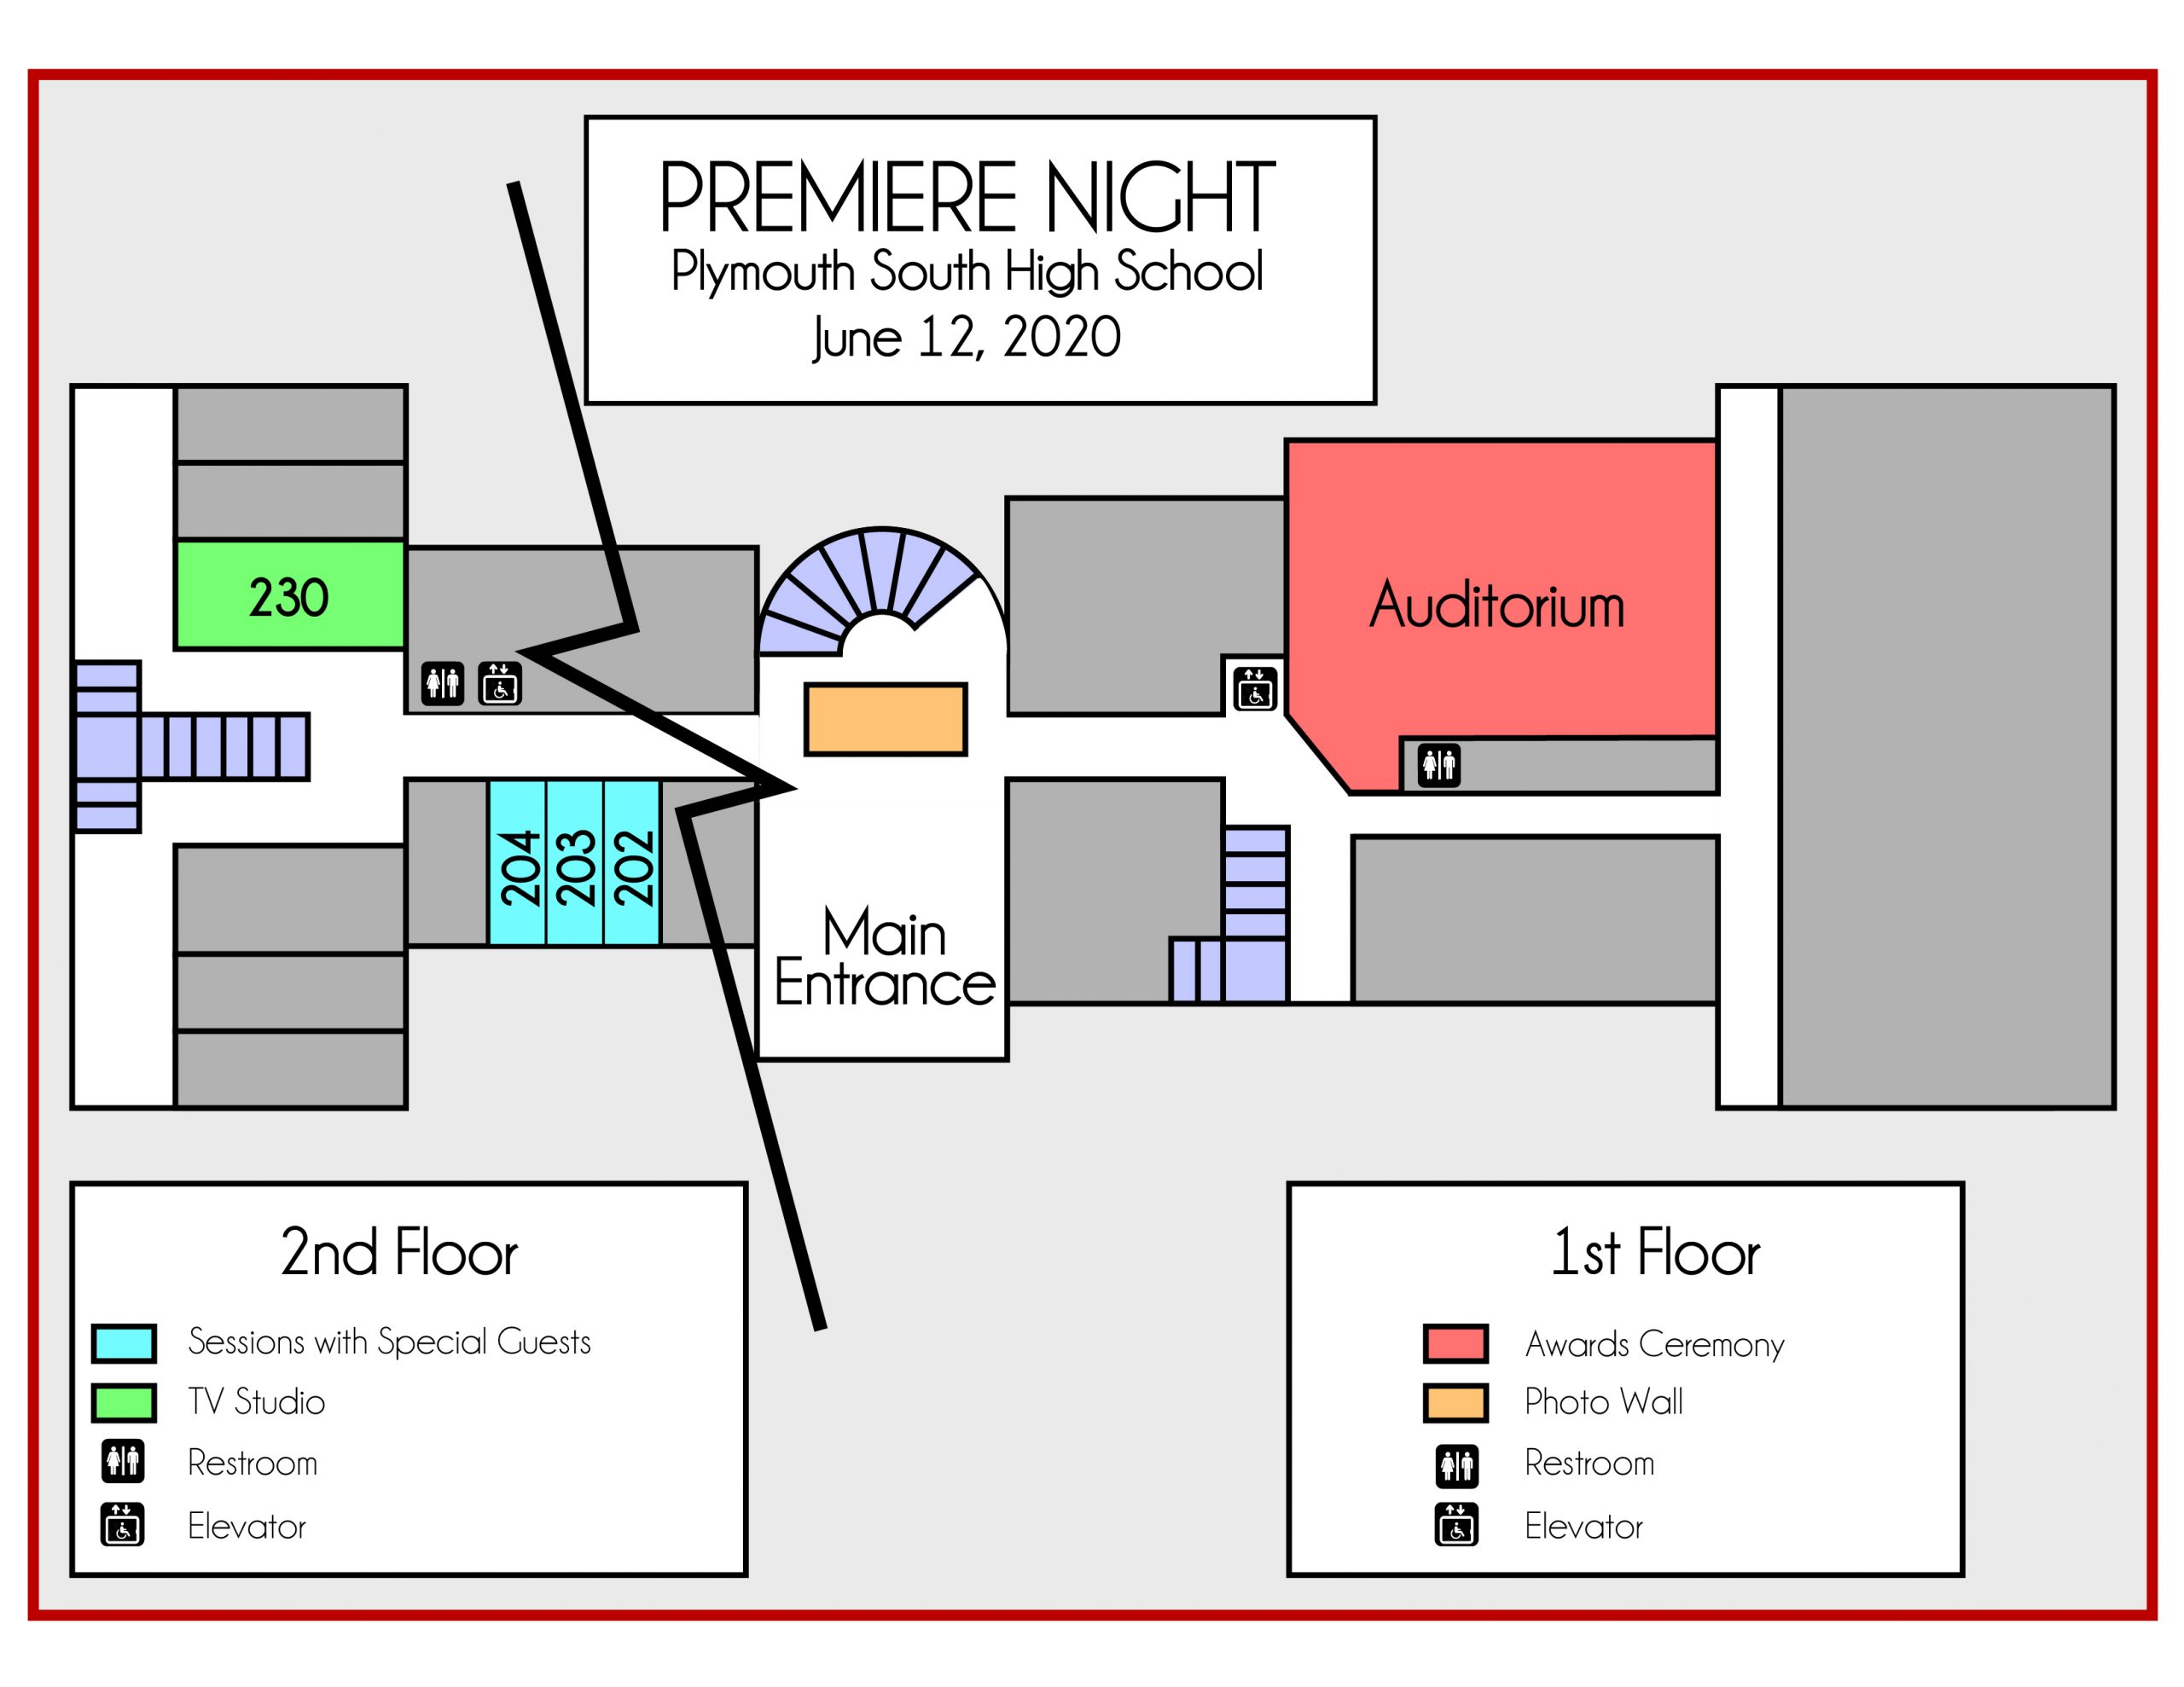 premiere-night-program-and-map_v3-02